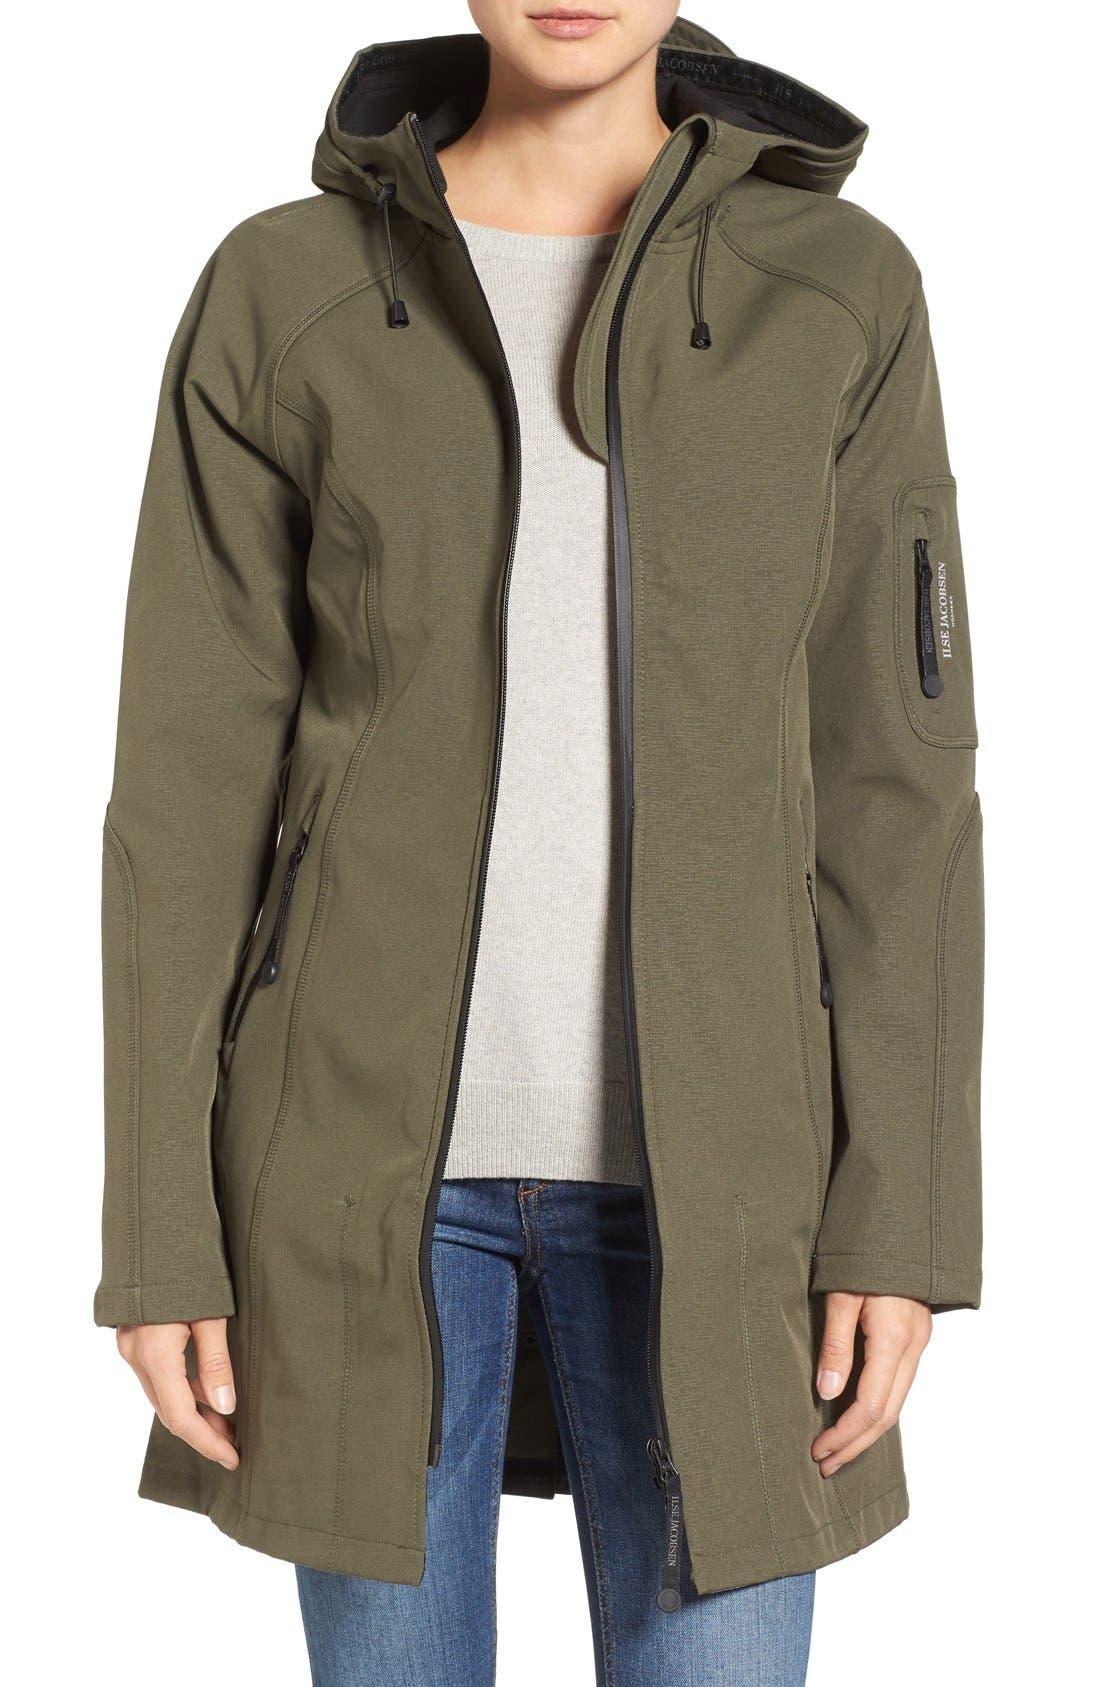 Alternate Image 1 Selected - Ilse Jacobsen Regular Fit Hooded Raincoat